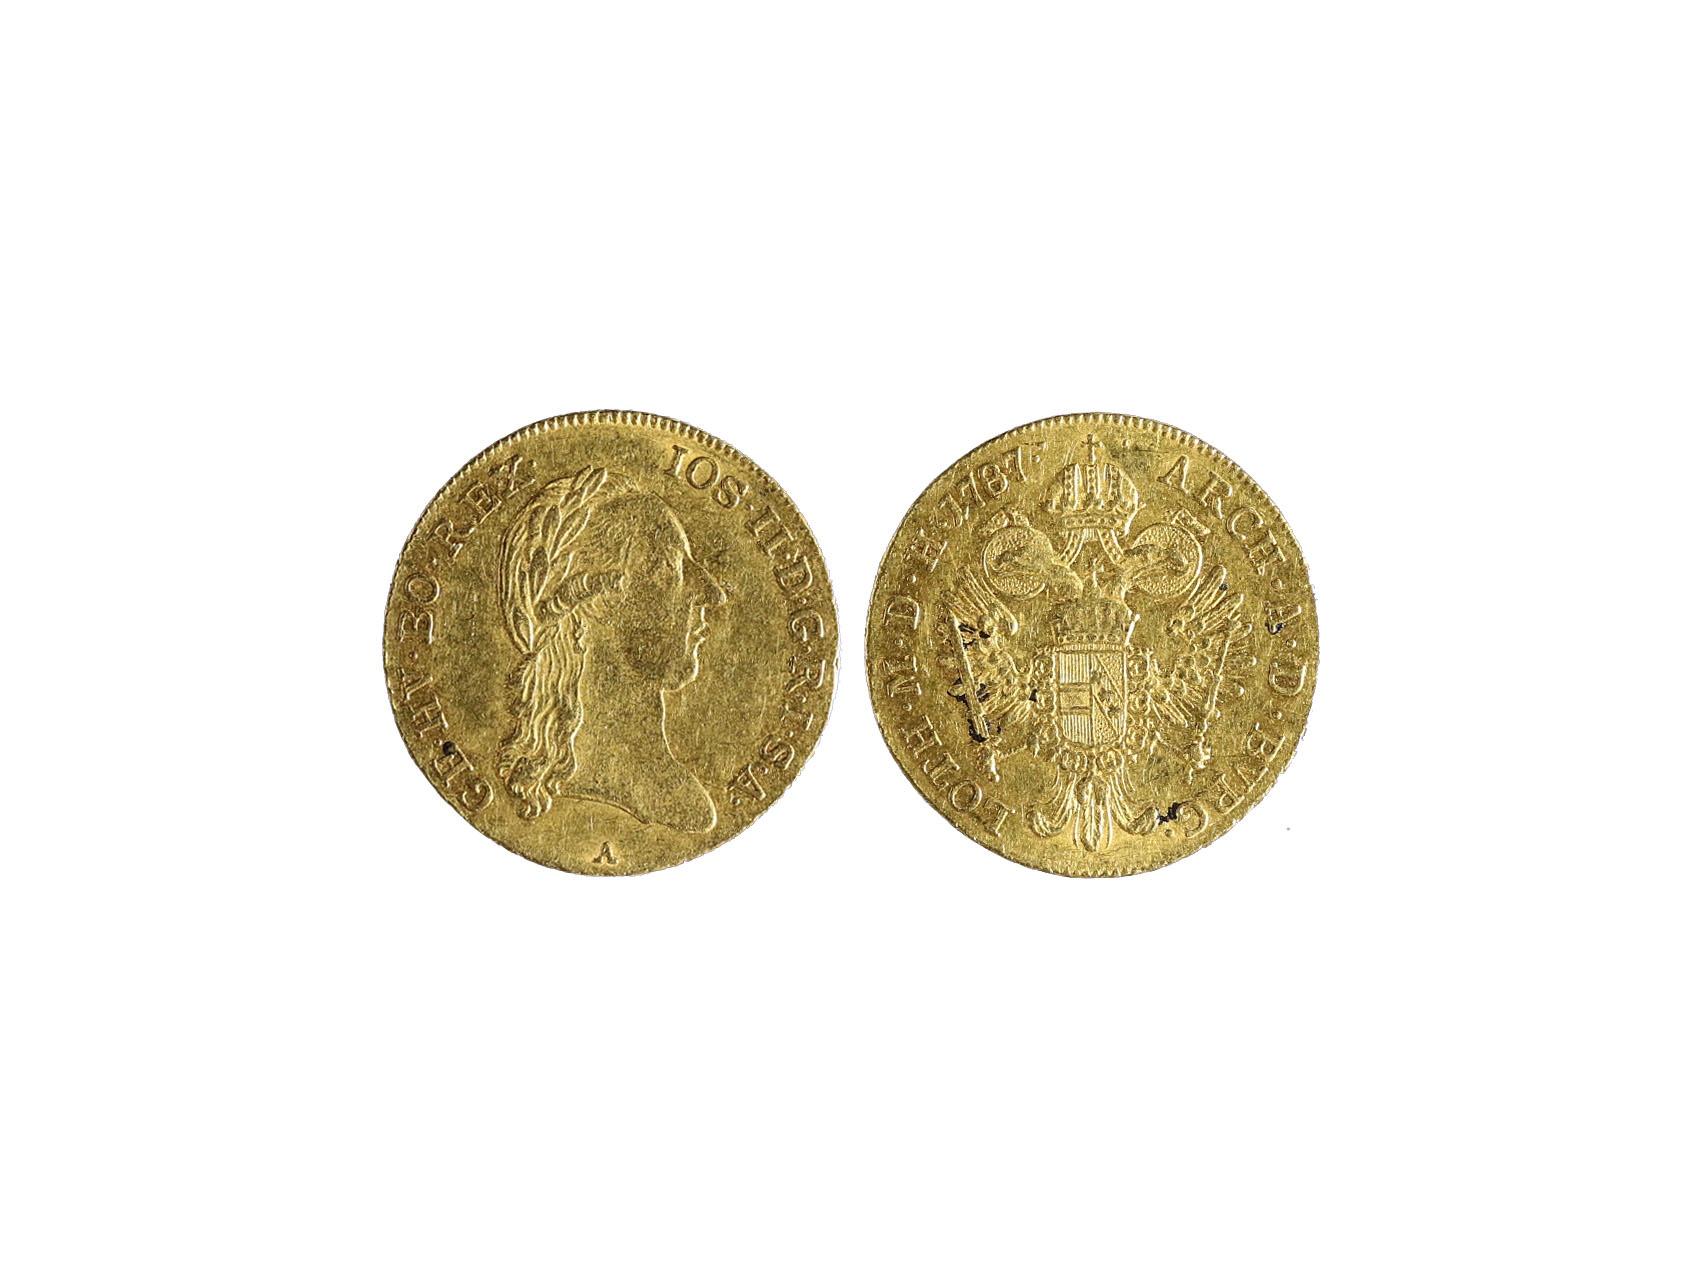 Josef II. 1765-1790 - Dukát 1787 A, váha 3,49 g, N55